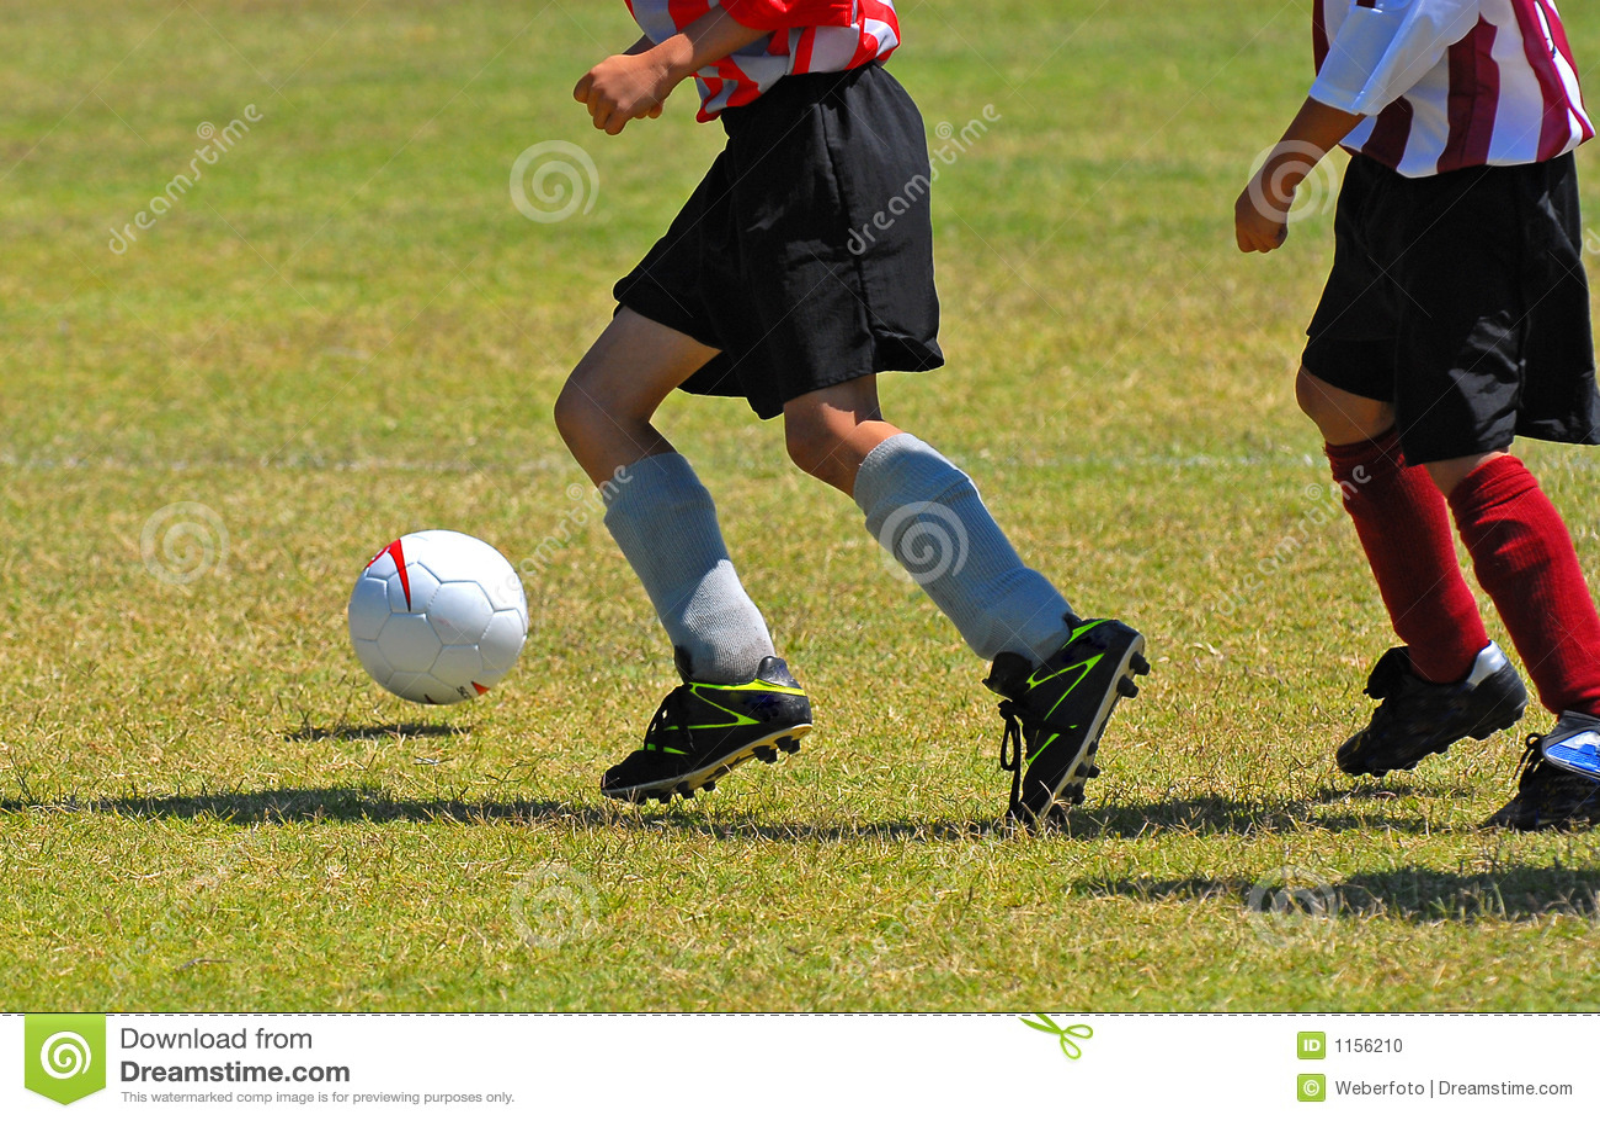 Boys Playing Soccer Stock Photo. Image Of Black, Ball